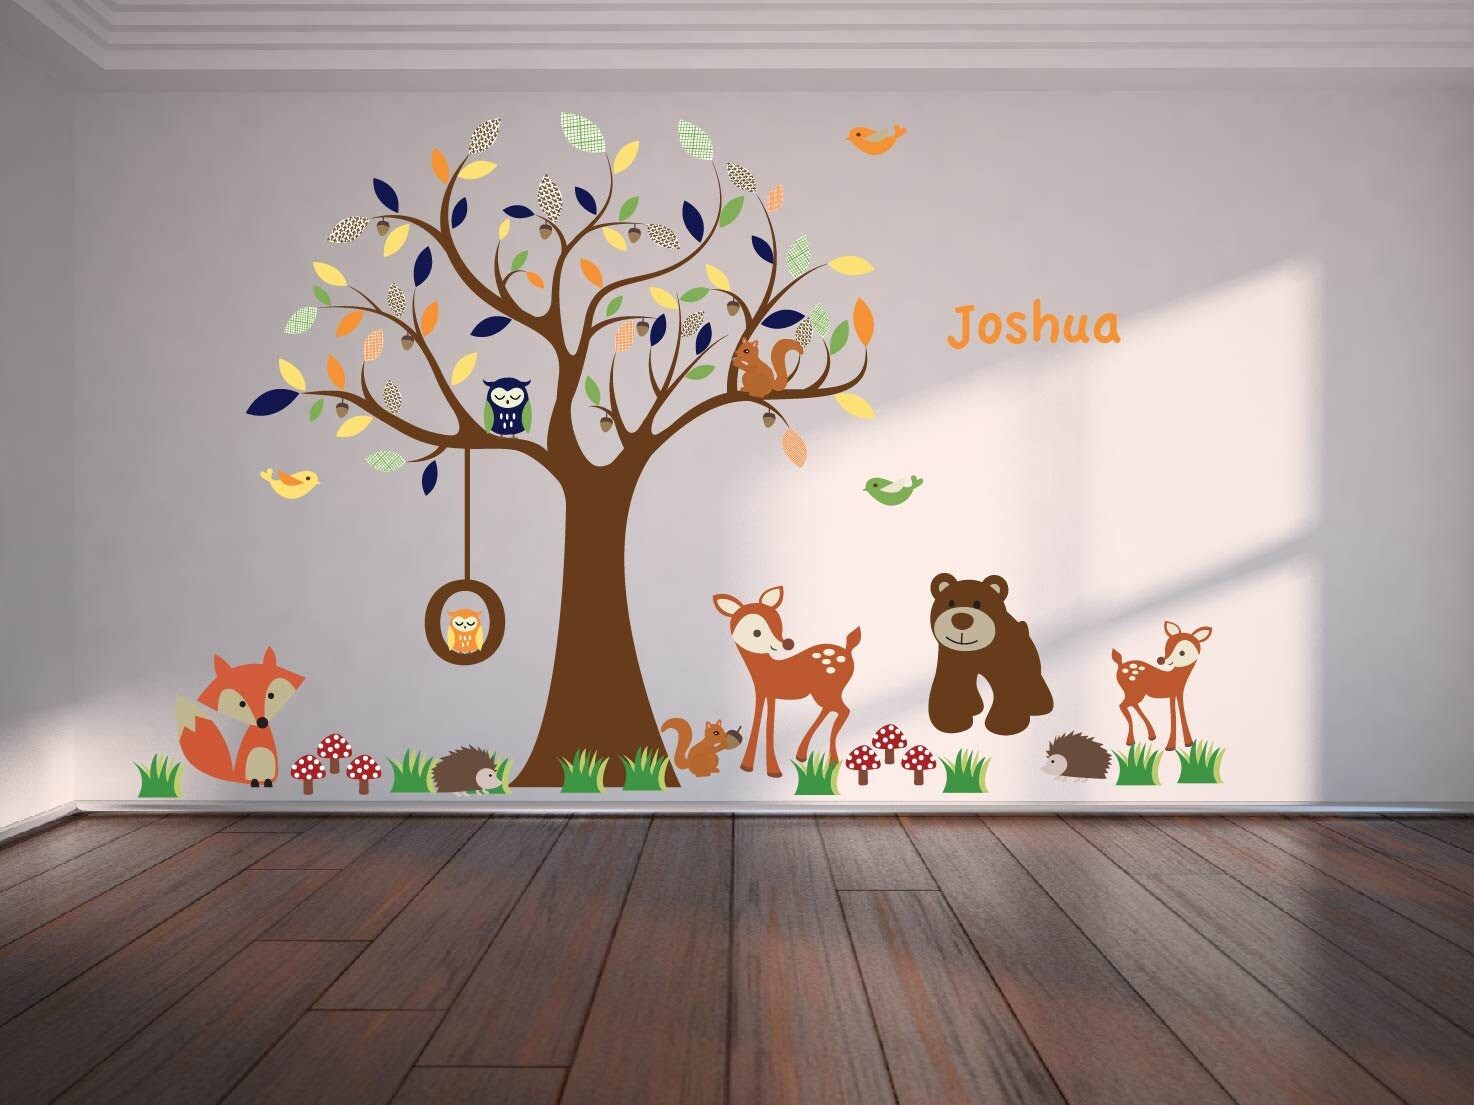 Baum-Aufkleber Vinyl Wand Aufkleber Ast Kinderzimmer